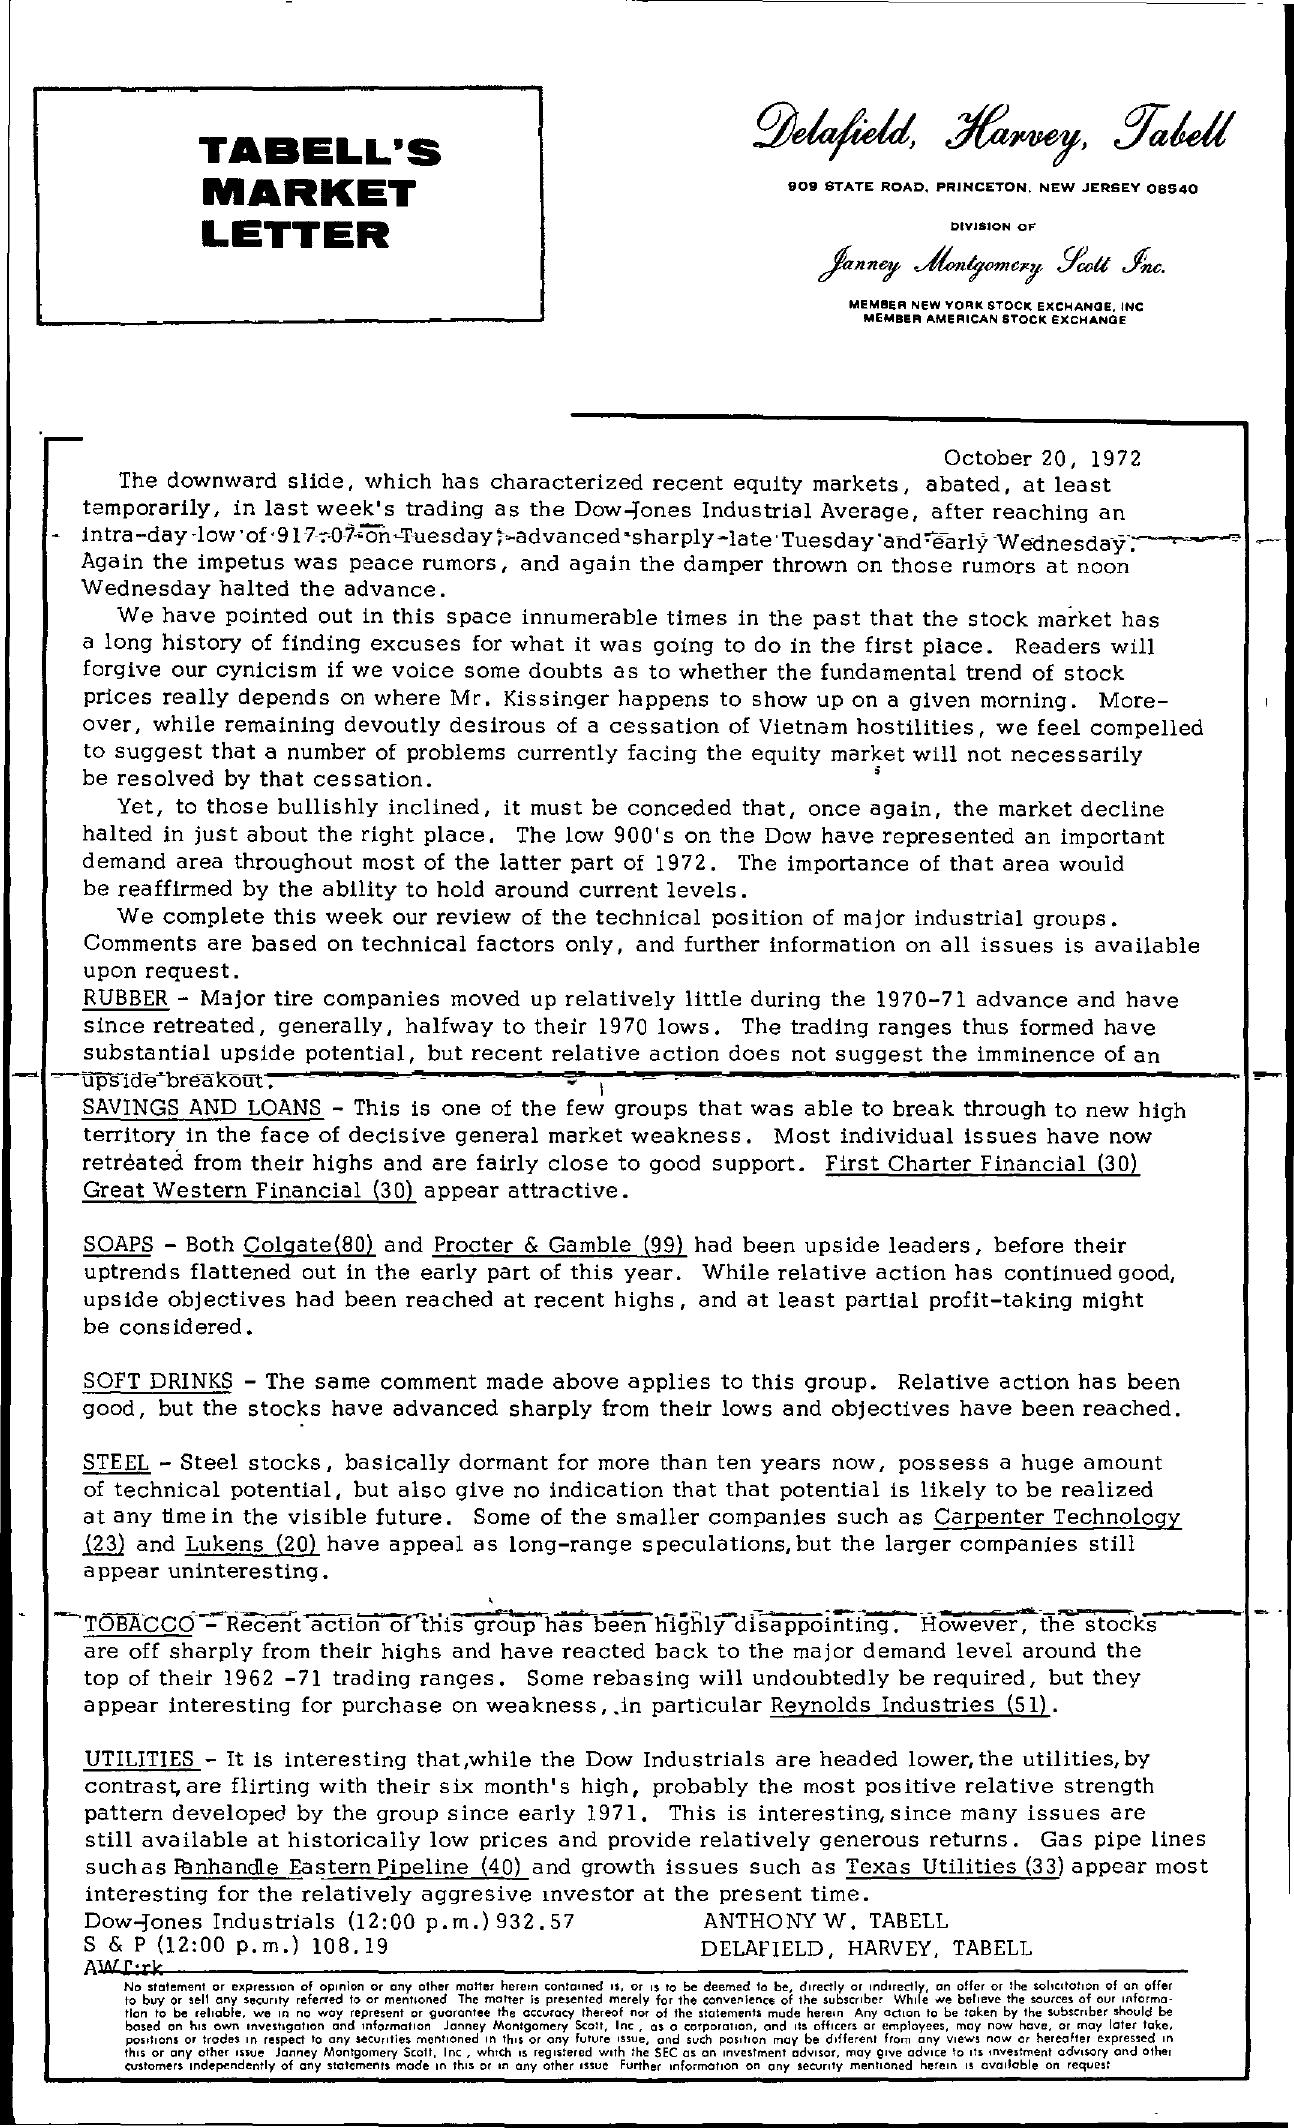 Tabell's Market Letter - October 20, 1972